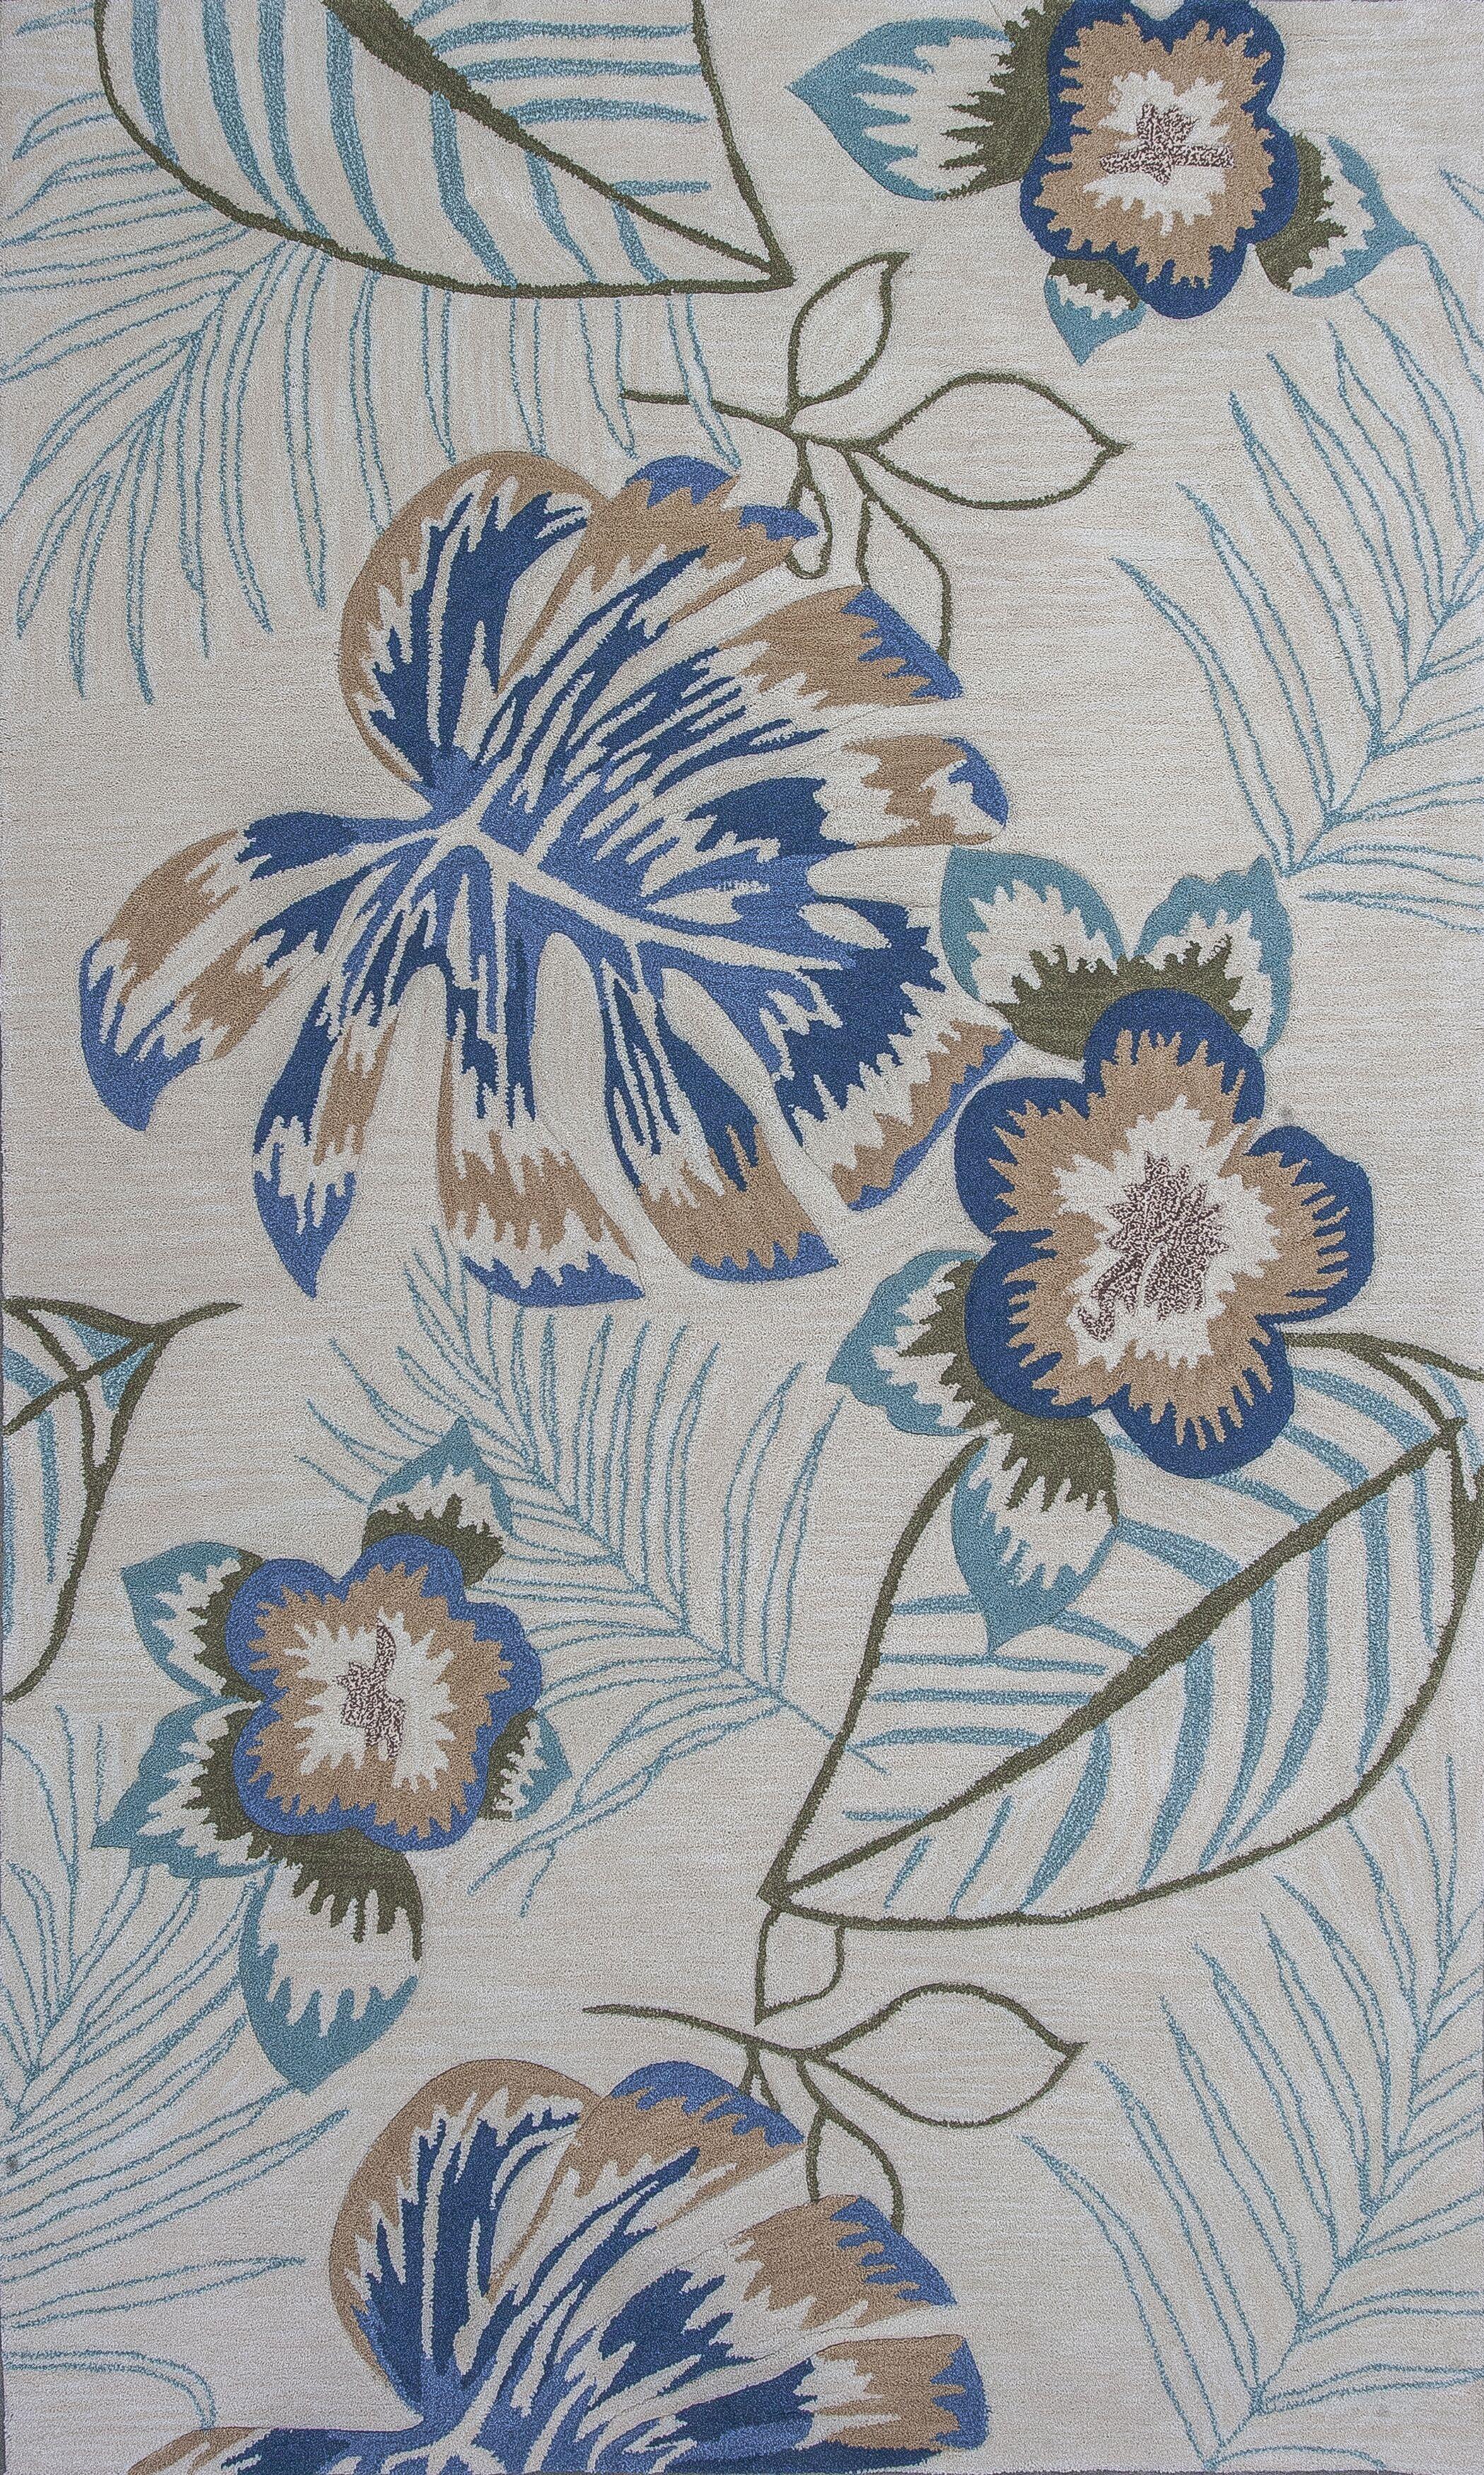 Roselawn Ivory Maui Area Rug Rug Size: Rectangle 8' x 10'6